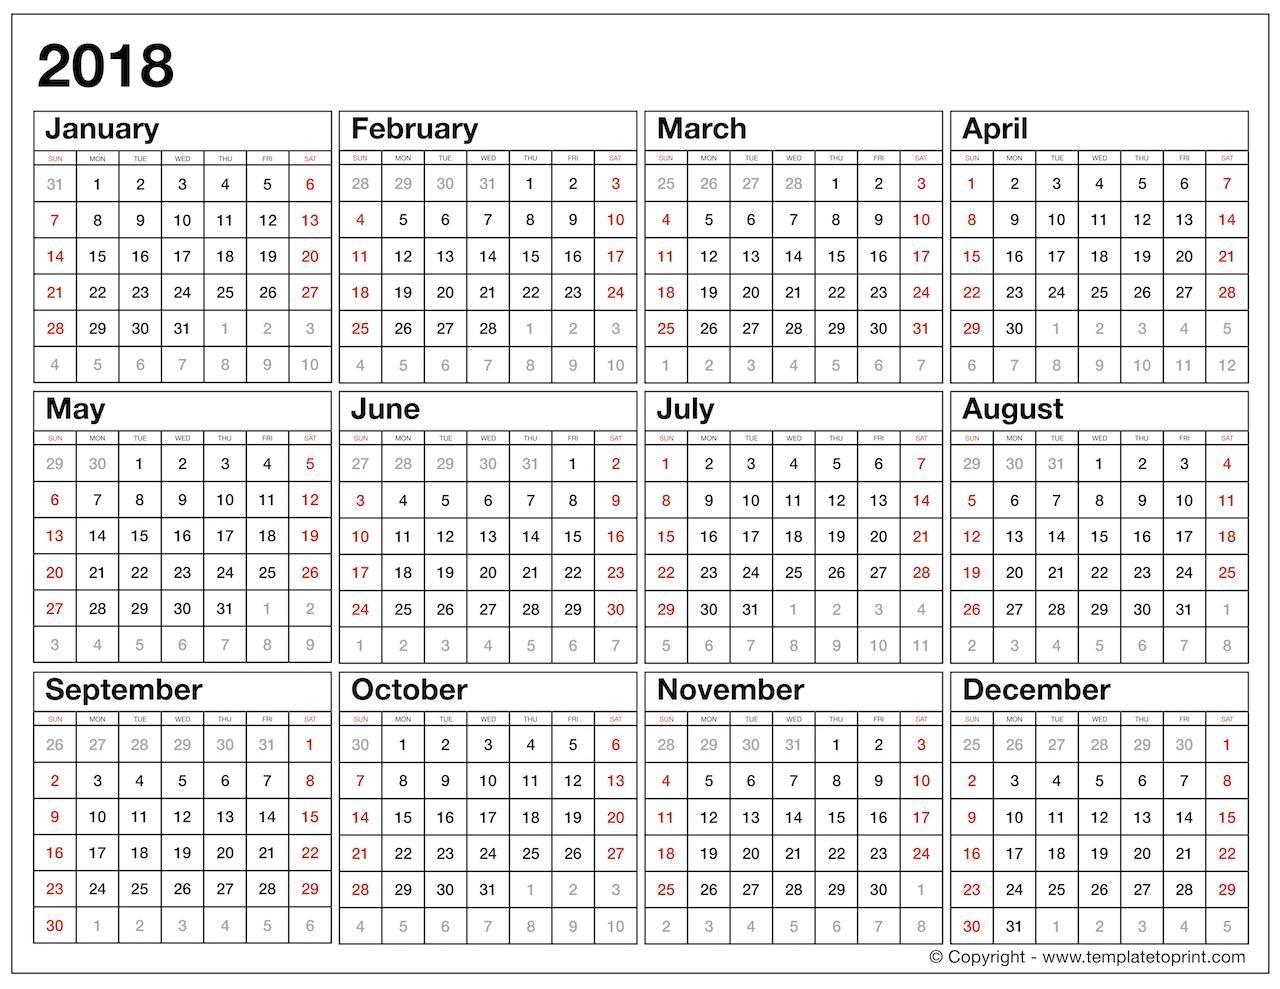 Year At A Glance Printable Calendar 2018 | Printable Calendar pertaining to Year At A Glance Printable Calendars